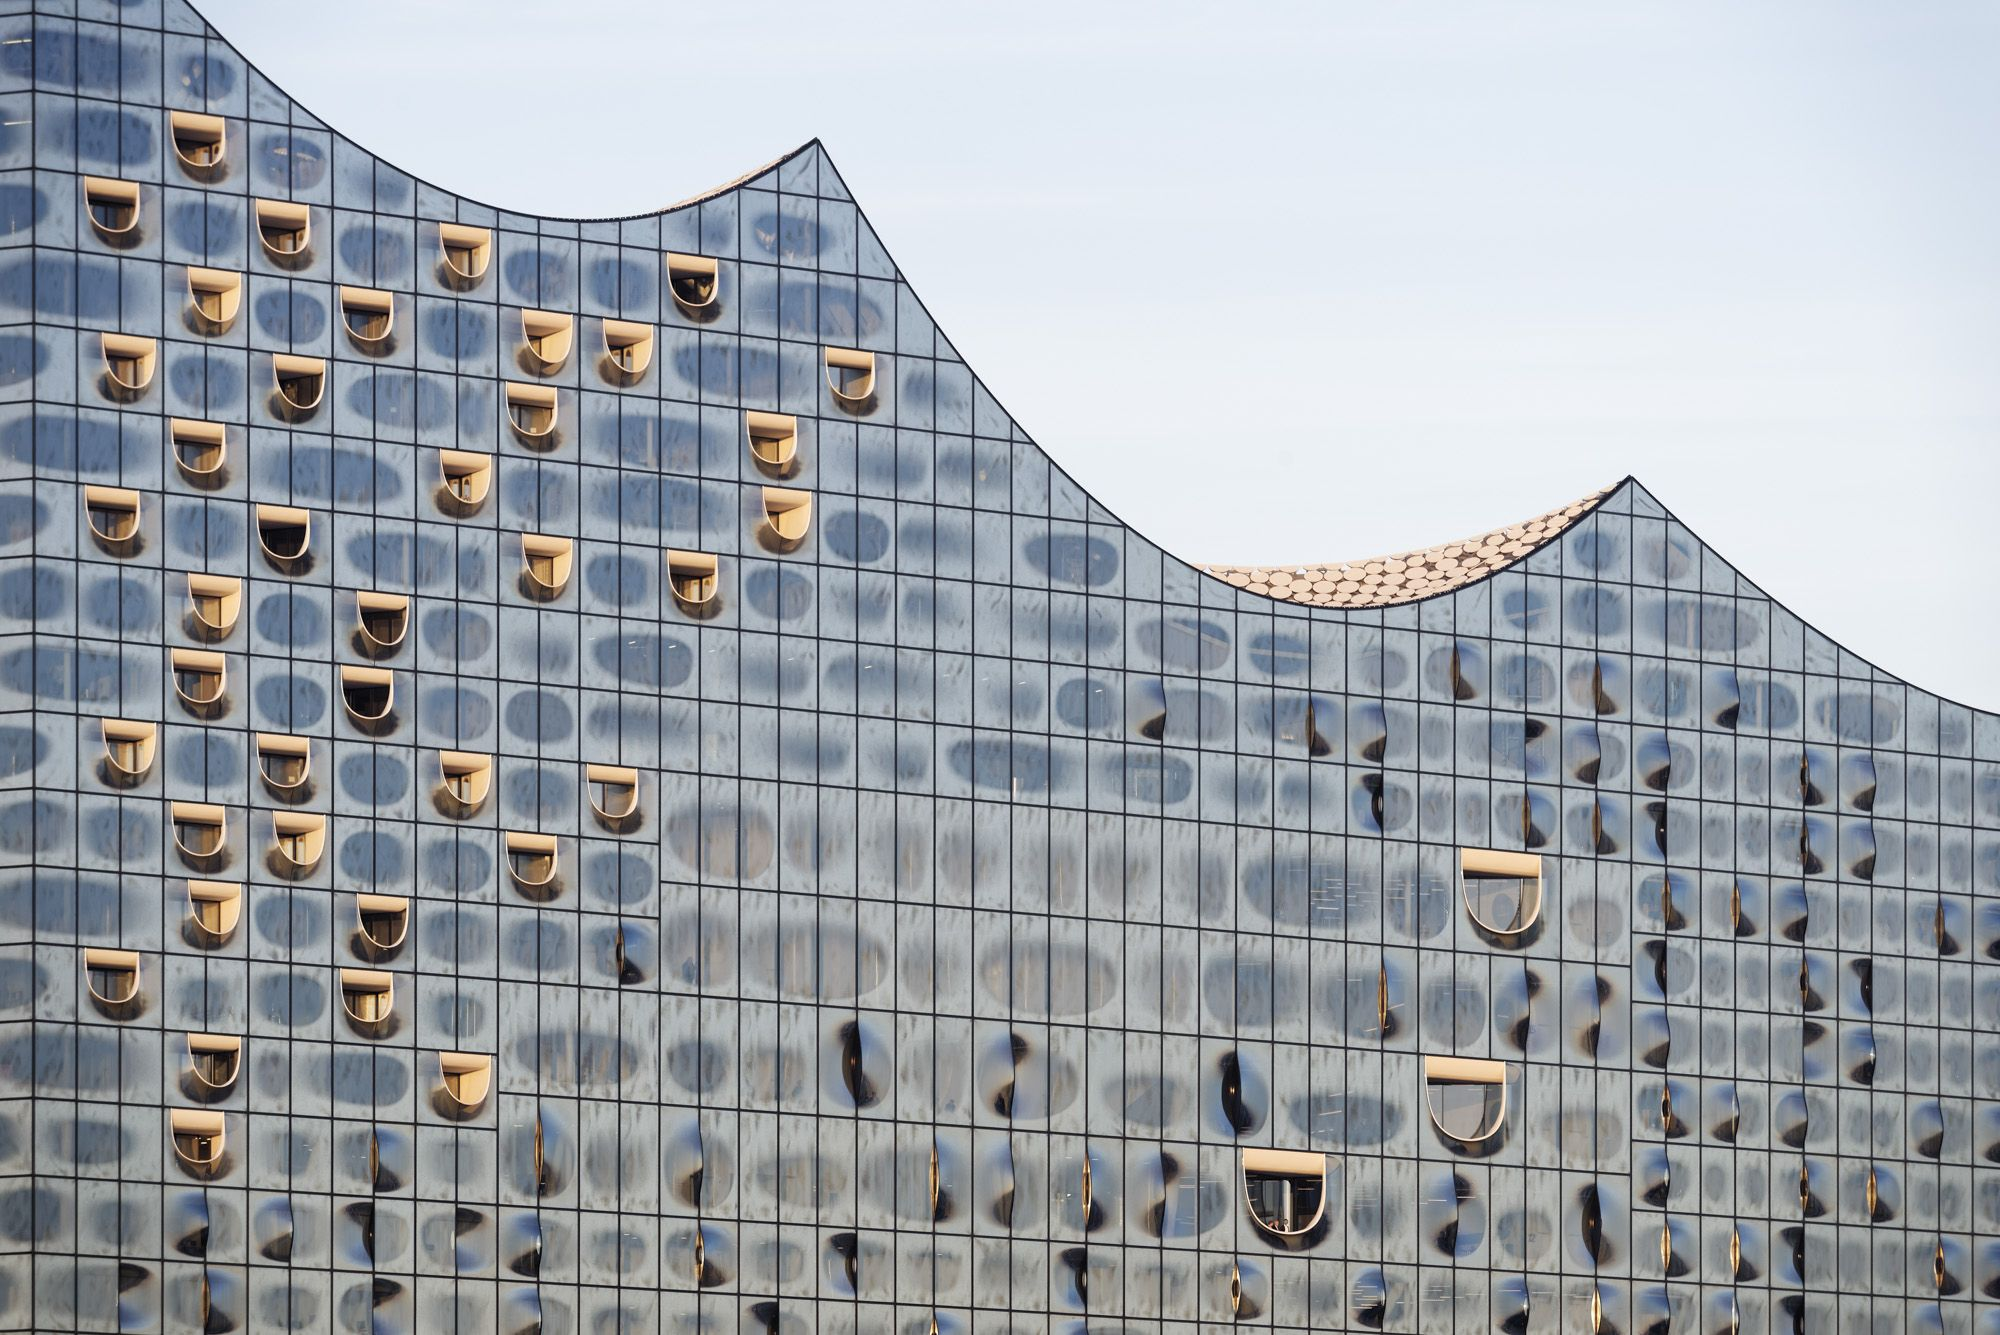 Elbphilharmonie Hamburg / fertiggestellt 2017 Foto : Architektur-photos.de / Mark Wohlrab